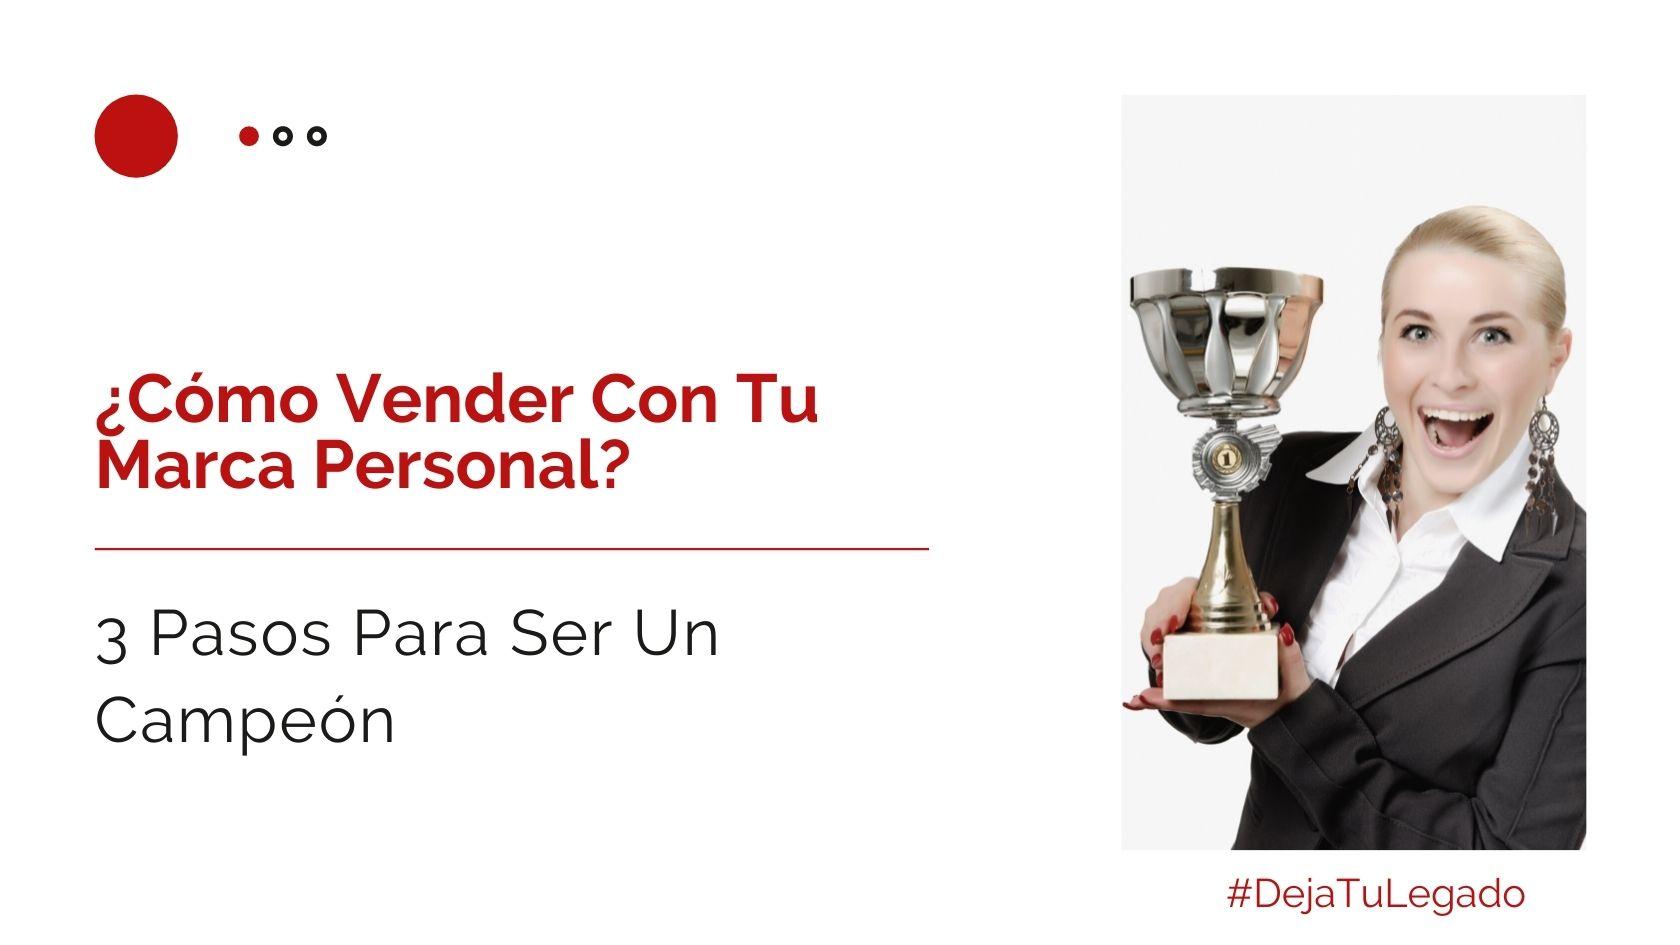 Héctor Jimenez - Employer Branding Vs Organizaciones De Papel - 1